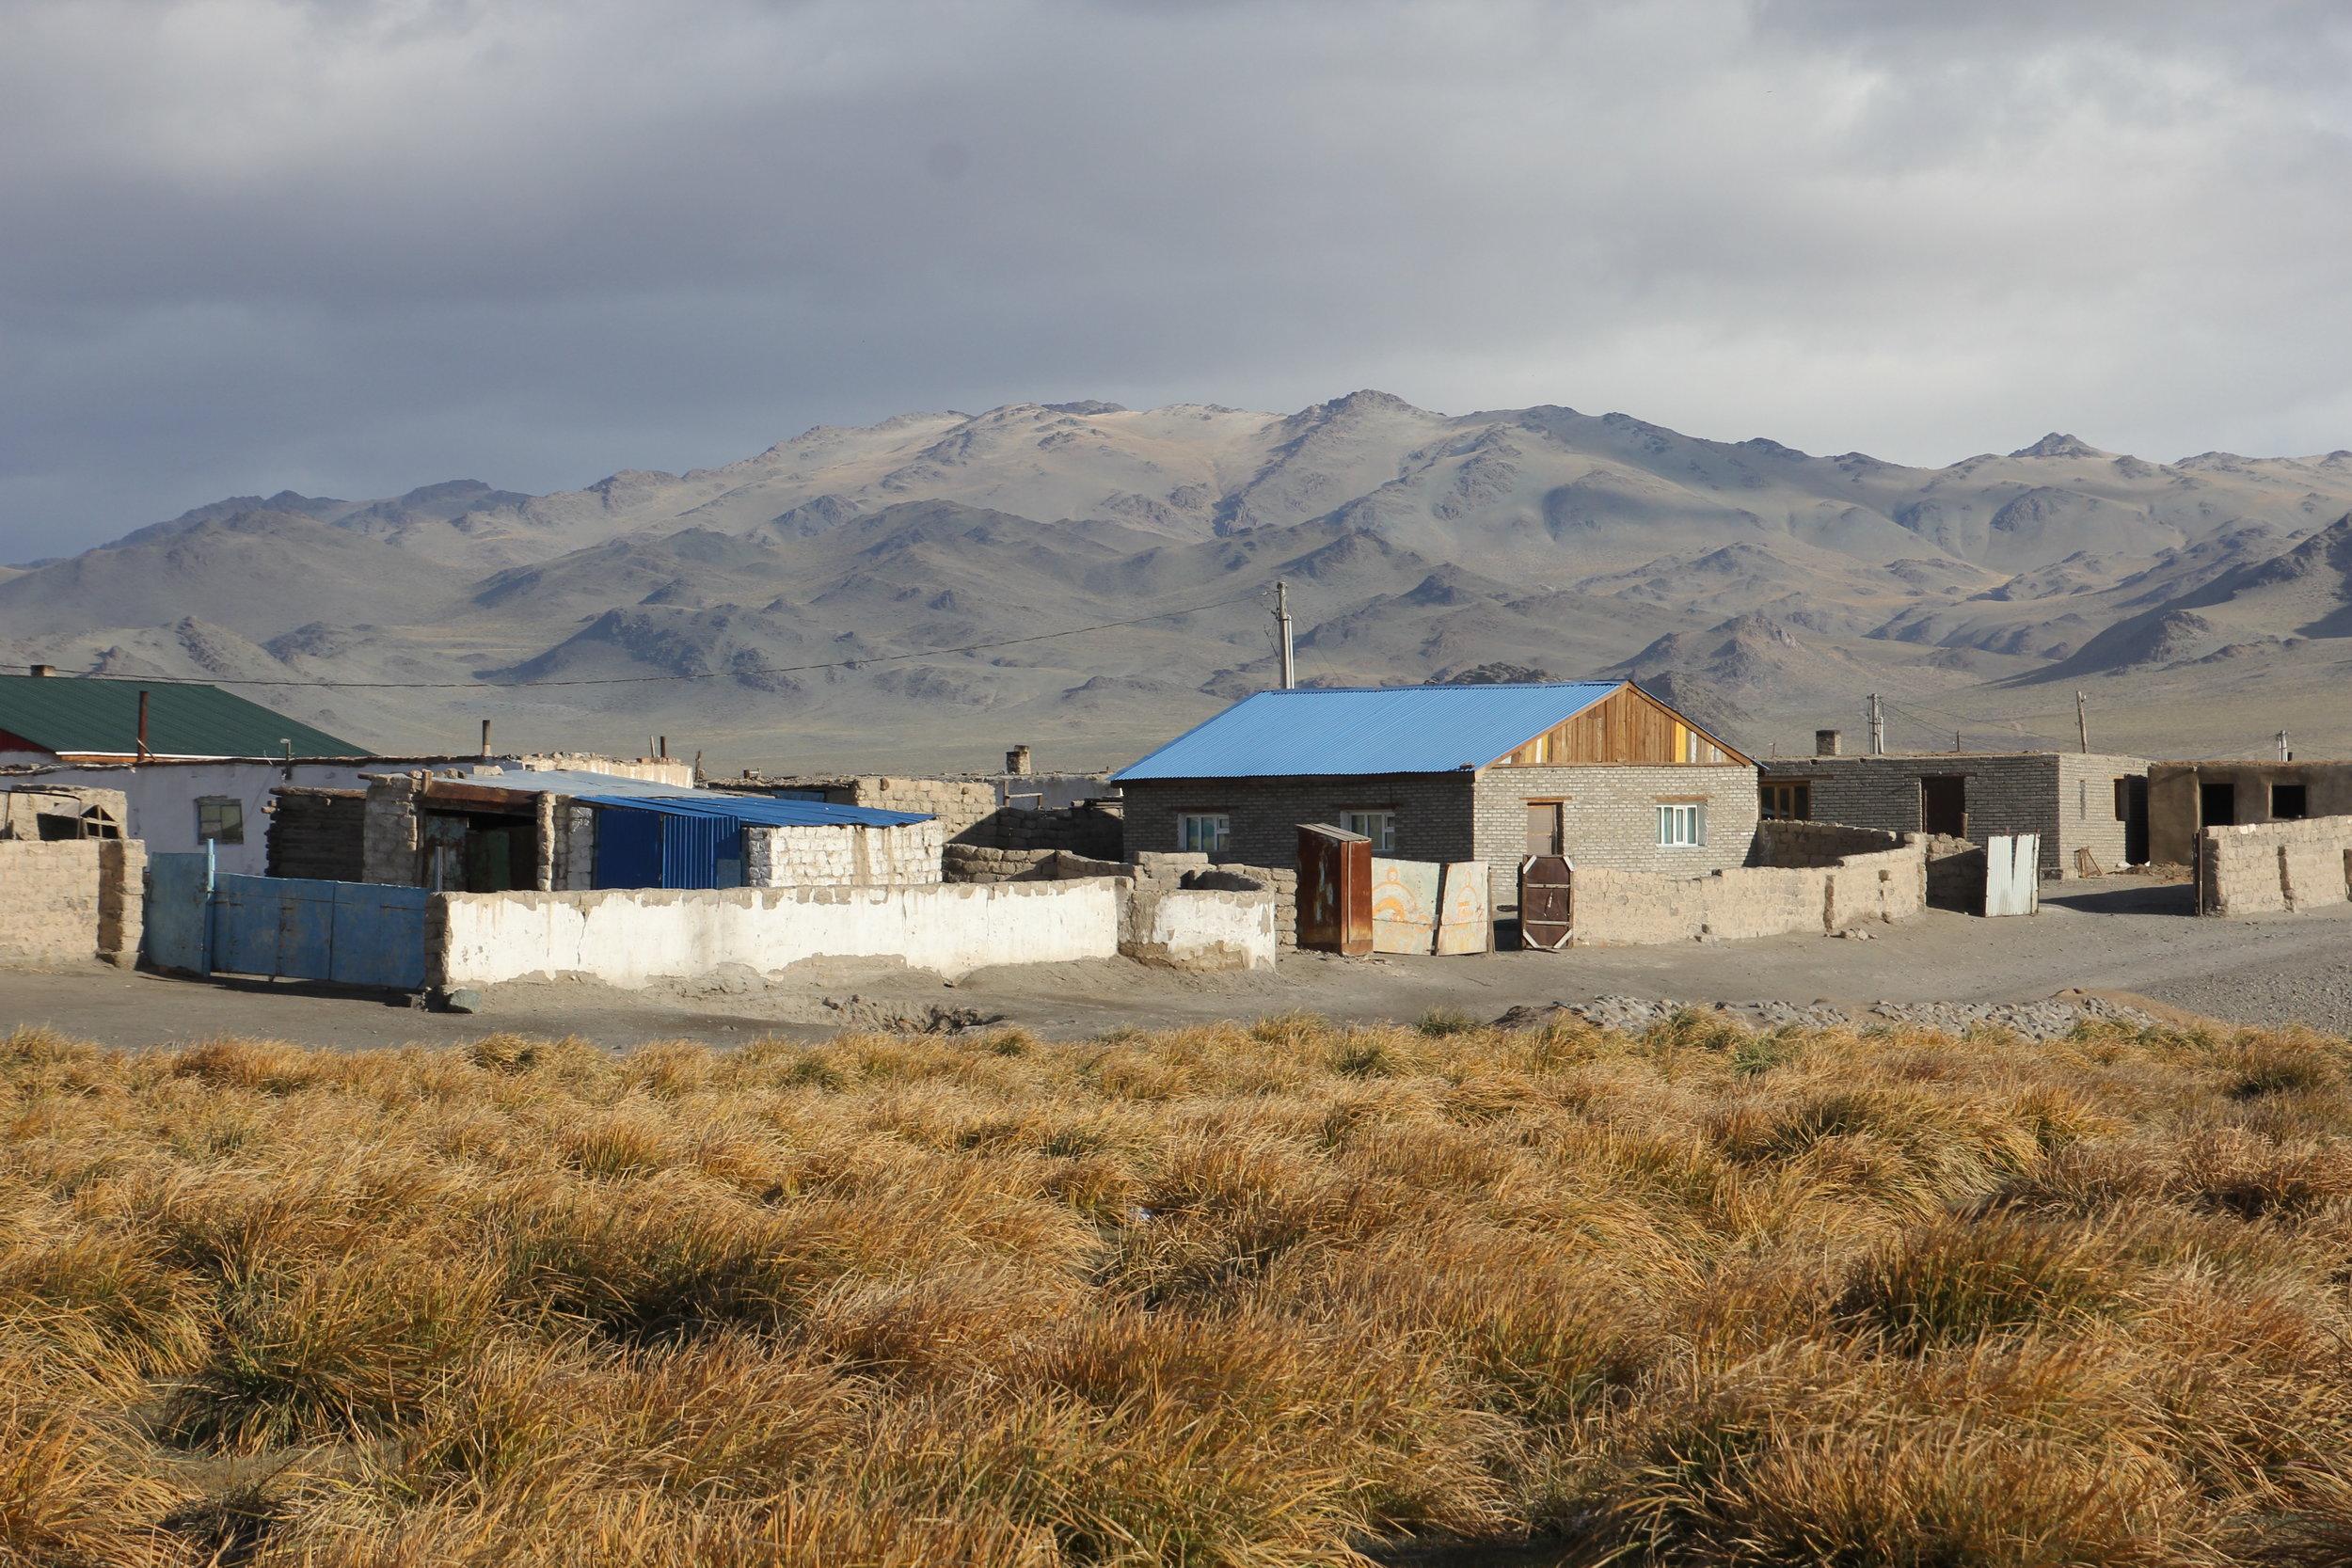 Olgi - the capital of Western Mongolia